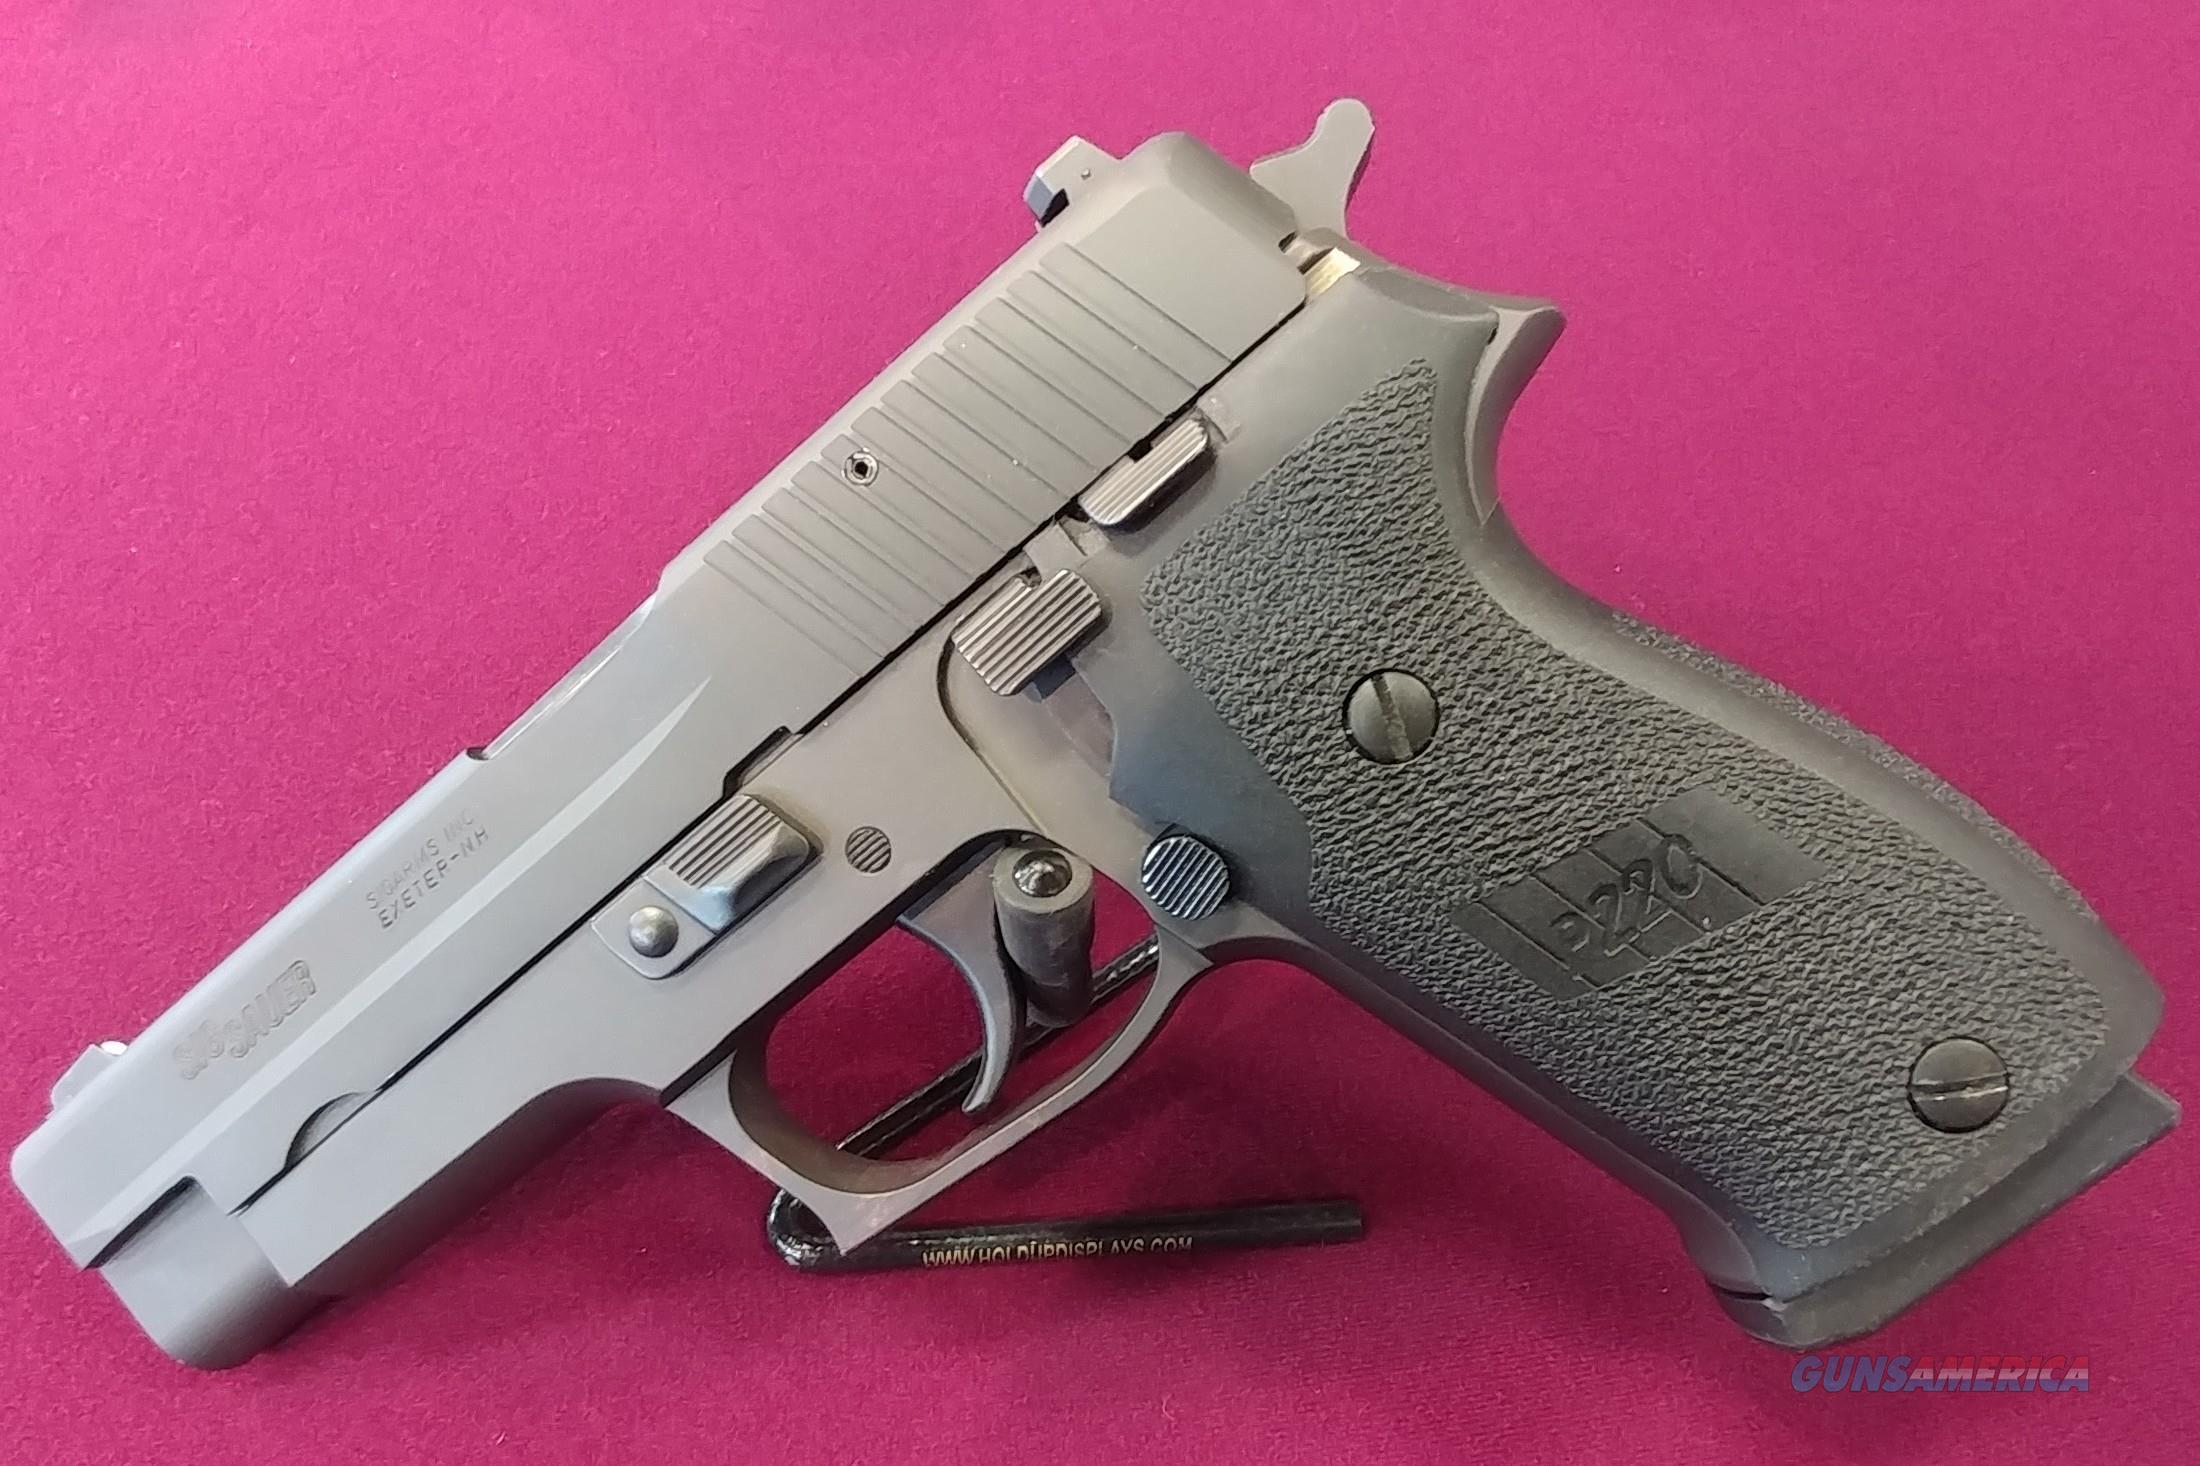 Sig Sauer P220 .45 ACP  Guns > Pistols > Sig - Sauer/Sigarms Pistols > P220